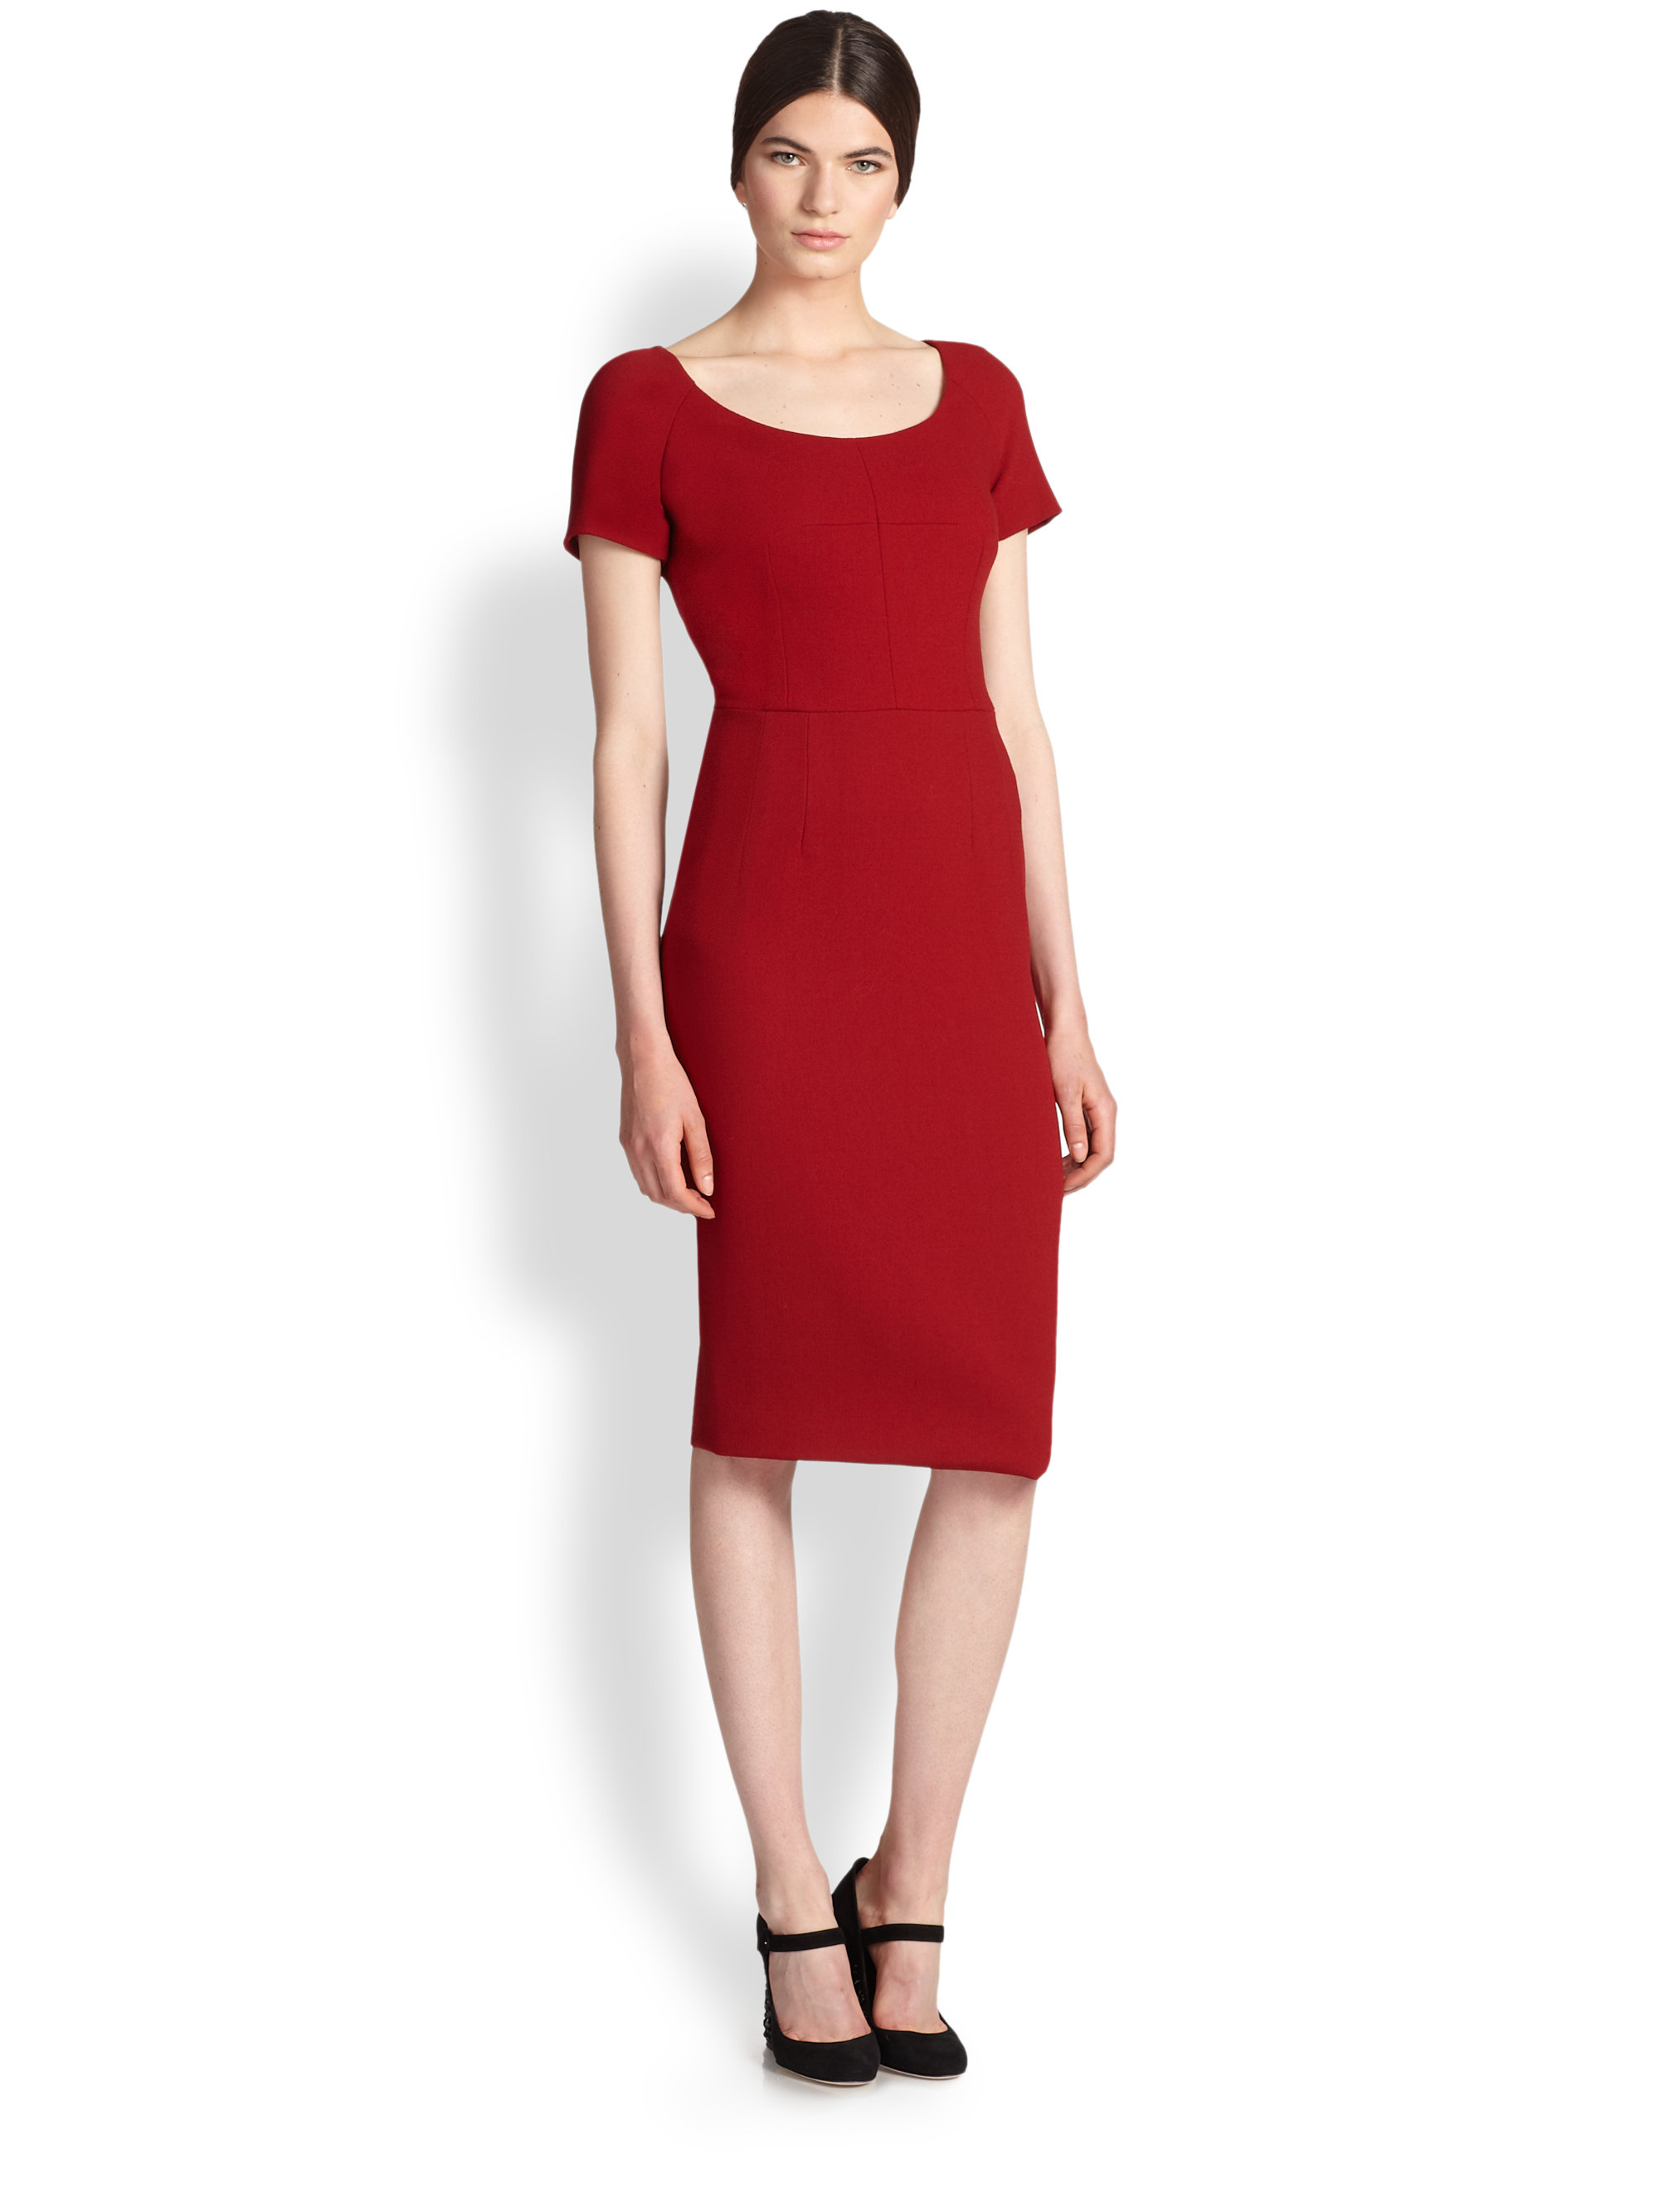 Red dress wool catalog photo